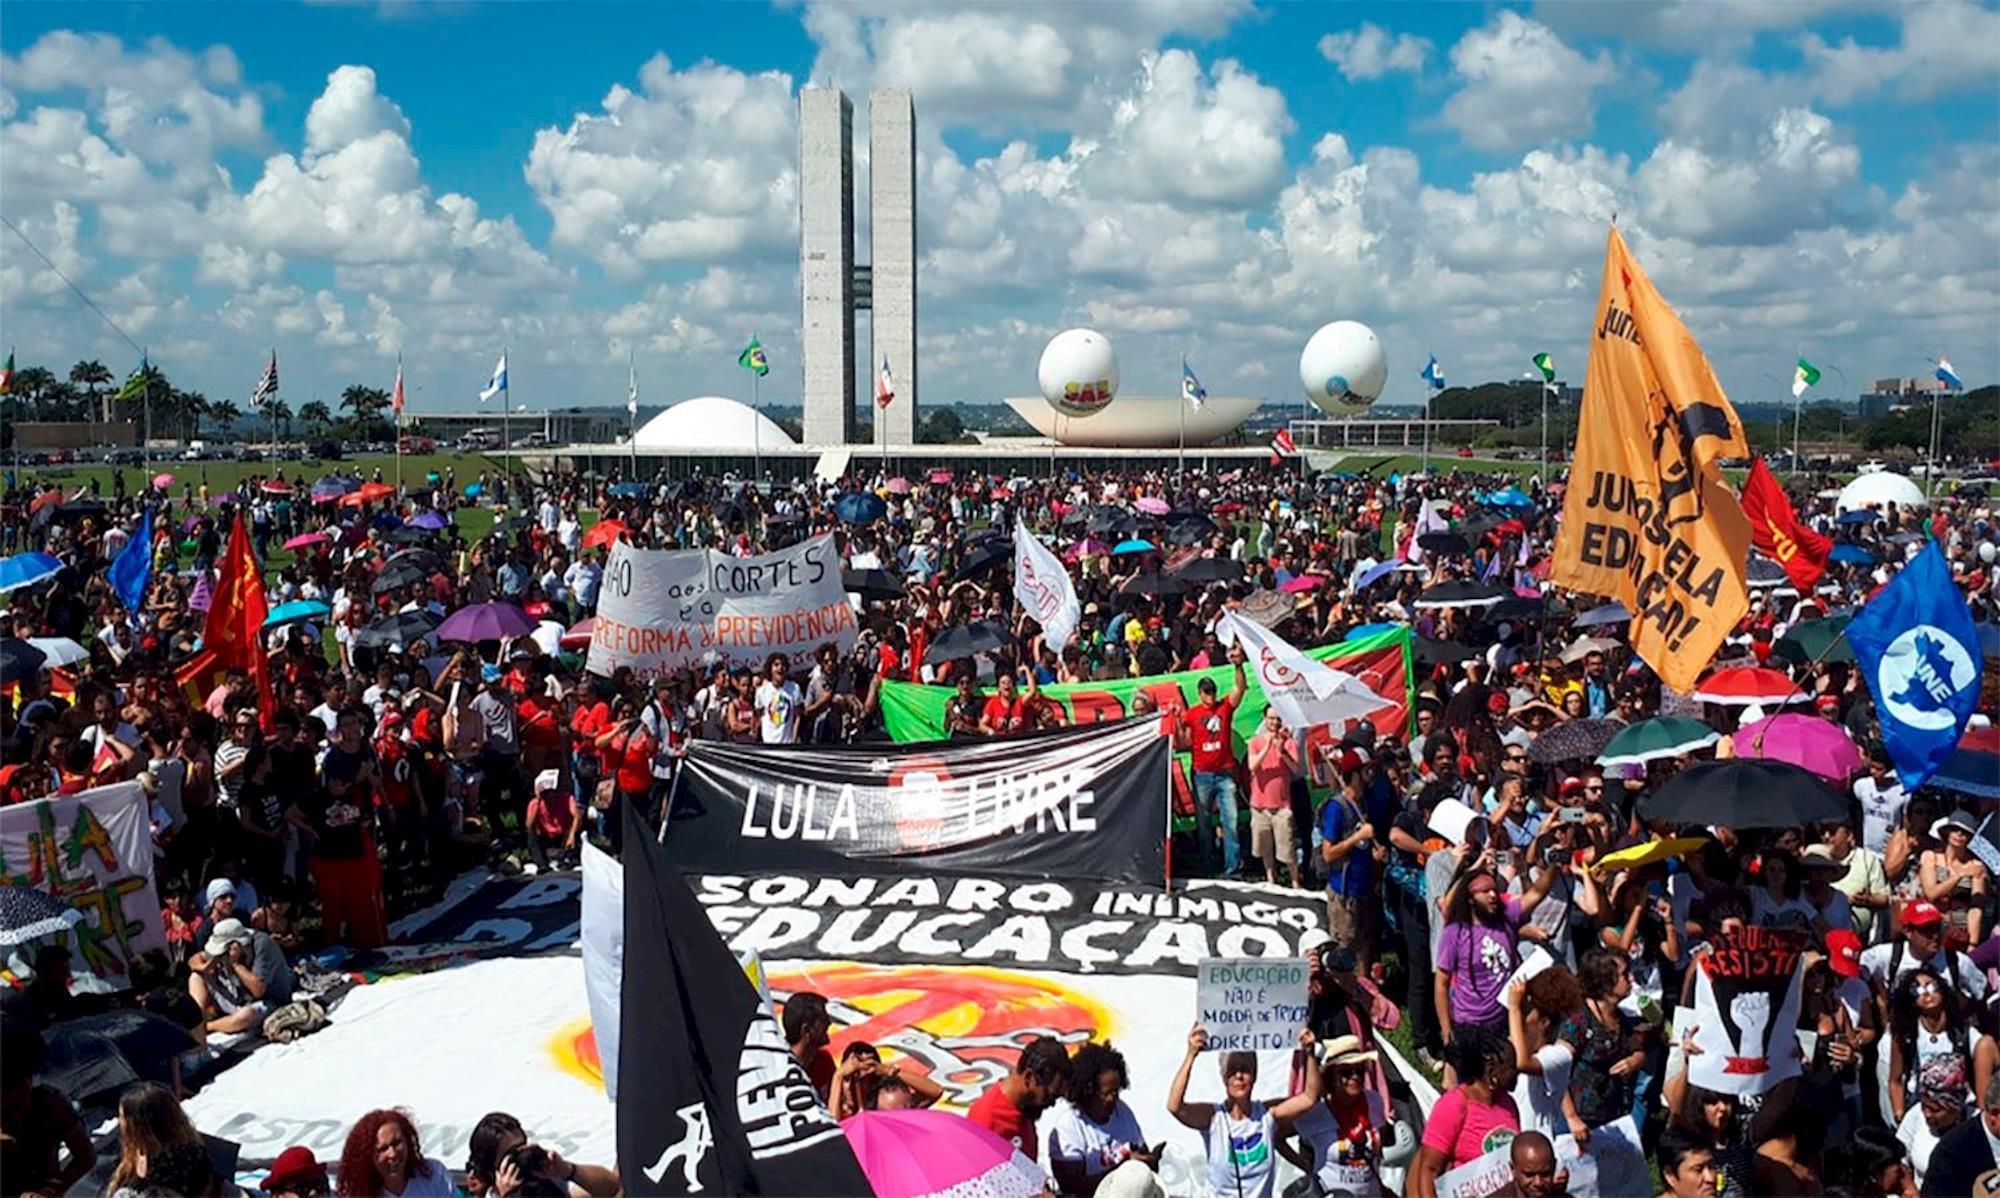 protesto, brasilia, tsunami, educação, MARCIELE BRUM/PCDOB NA CÂMARA